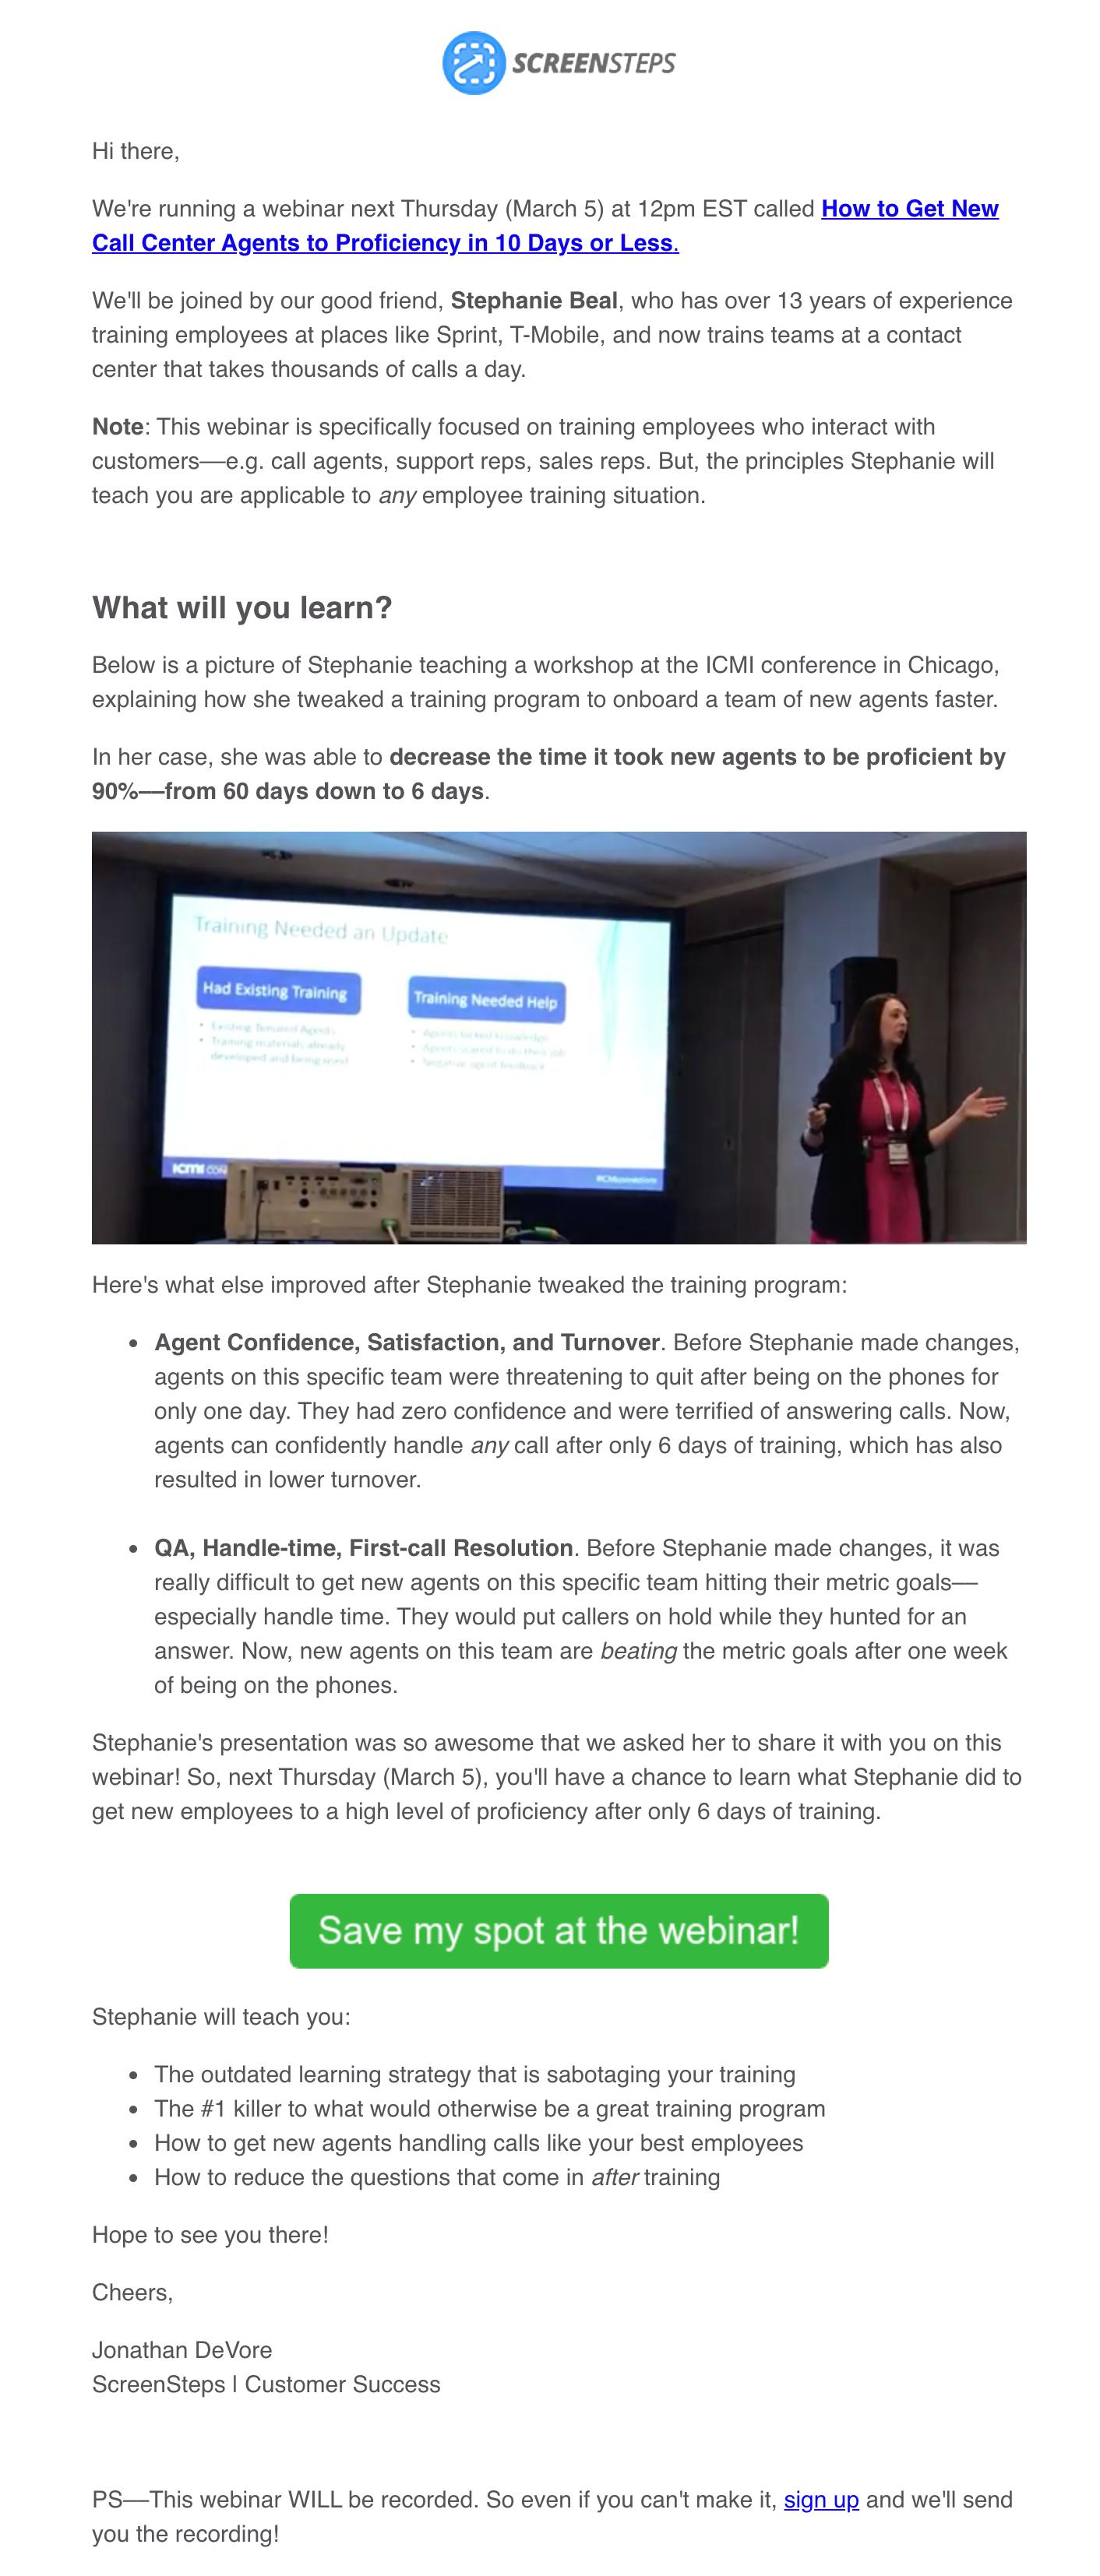 Screensteps-engagement-email